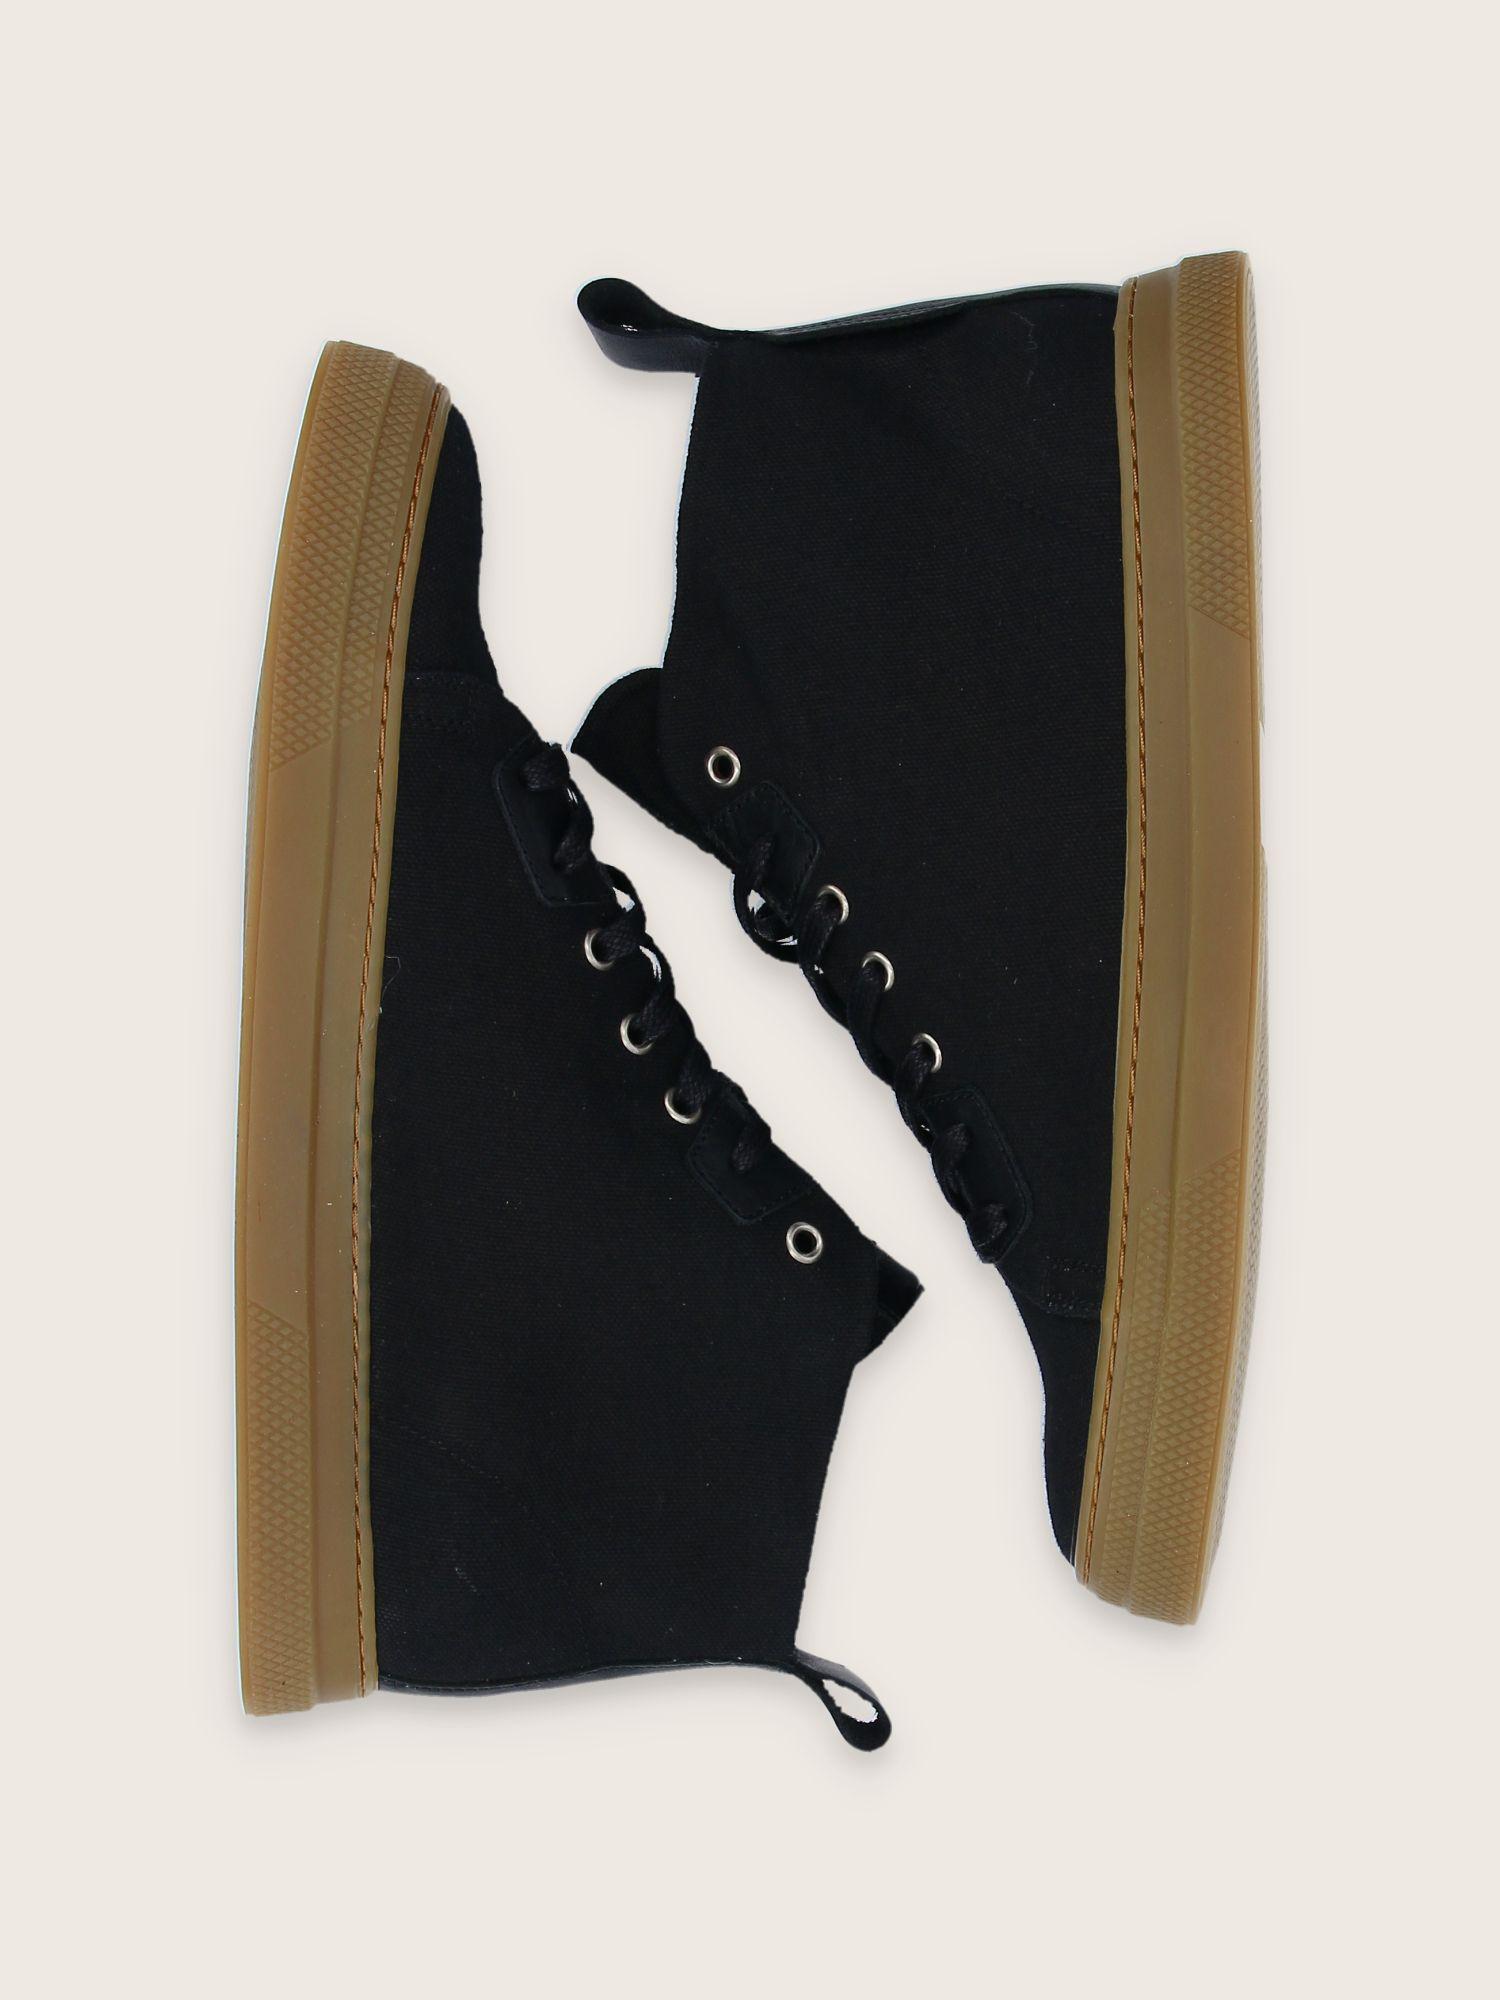 schmoove.fr SPARK HIGH CUT - LONA - BLACK SOLE L.GUM**WM